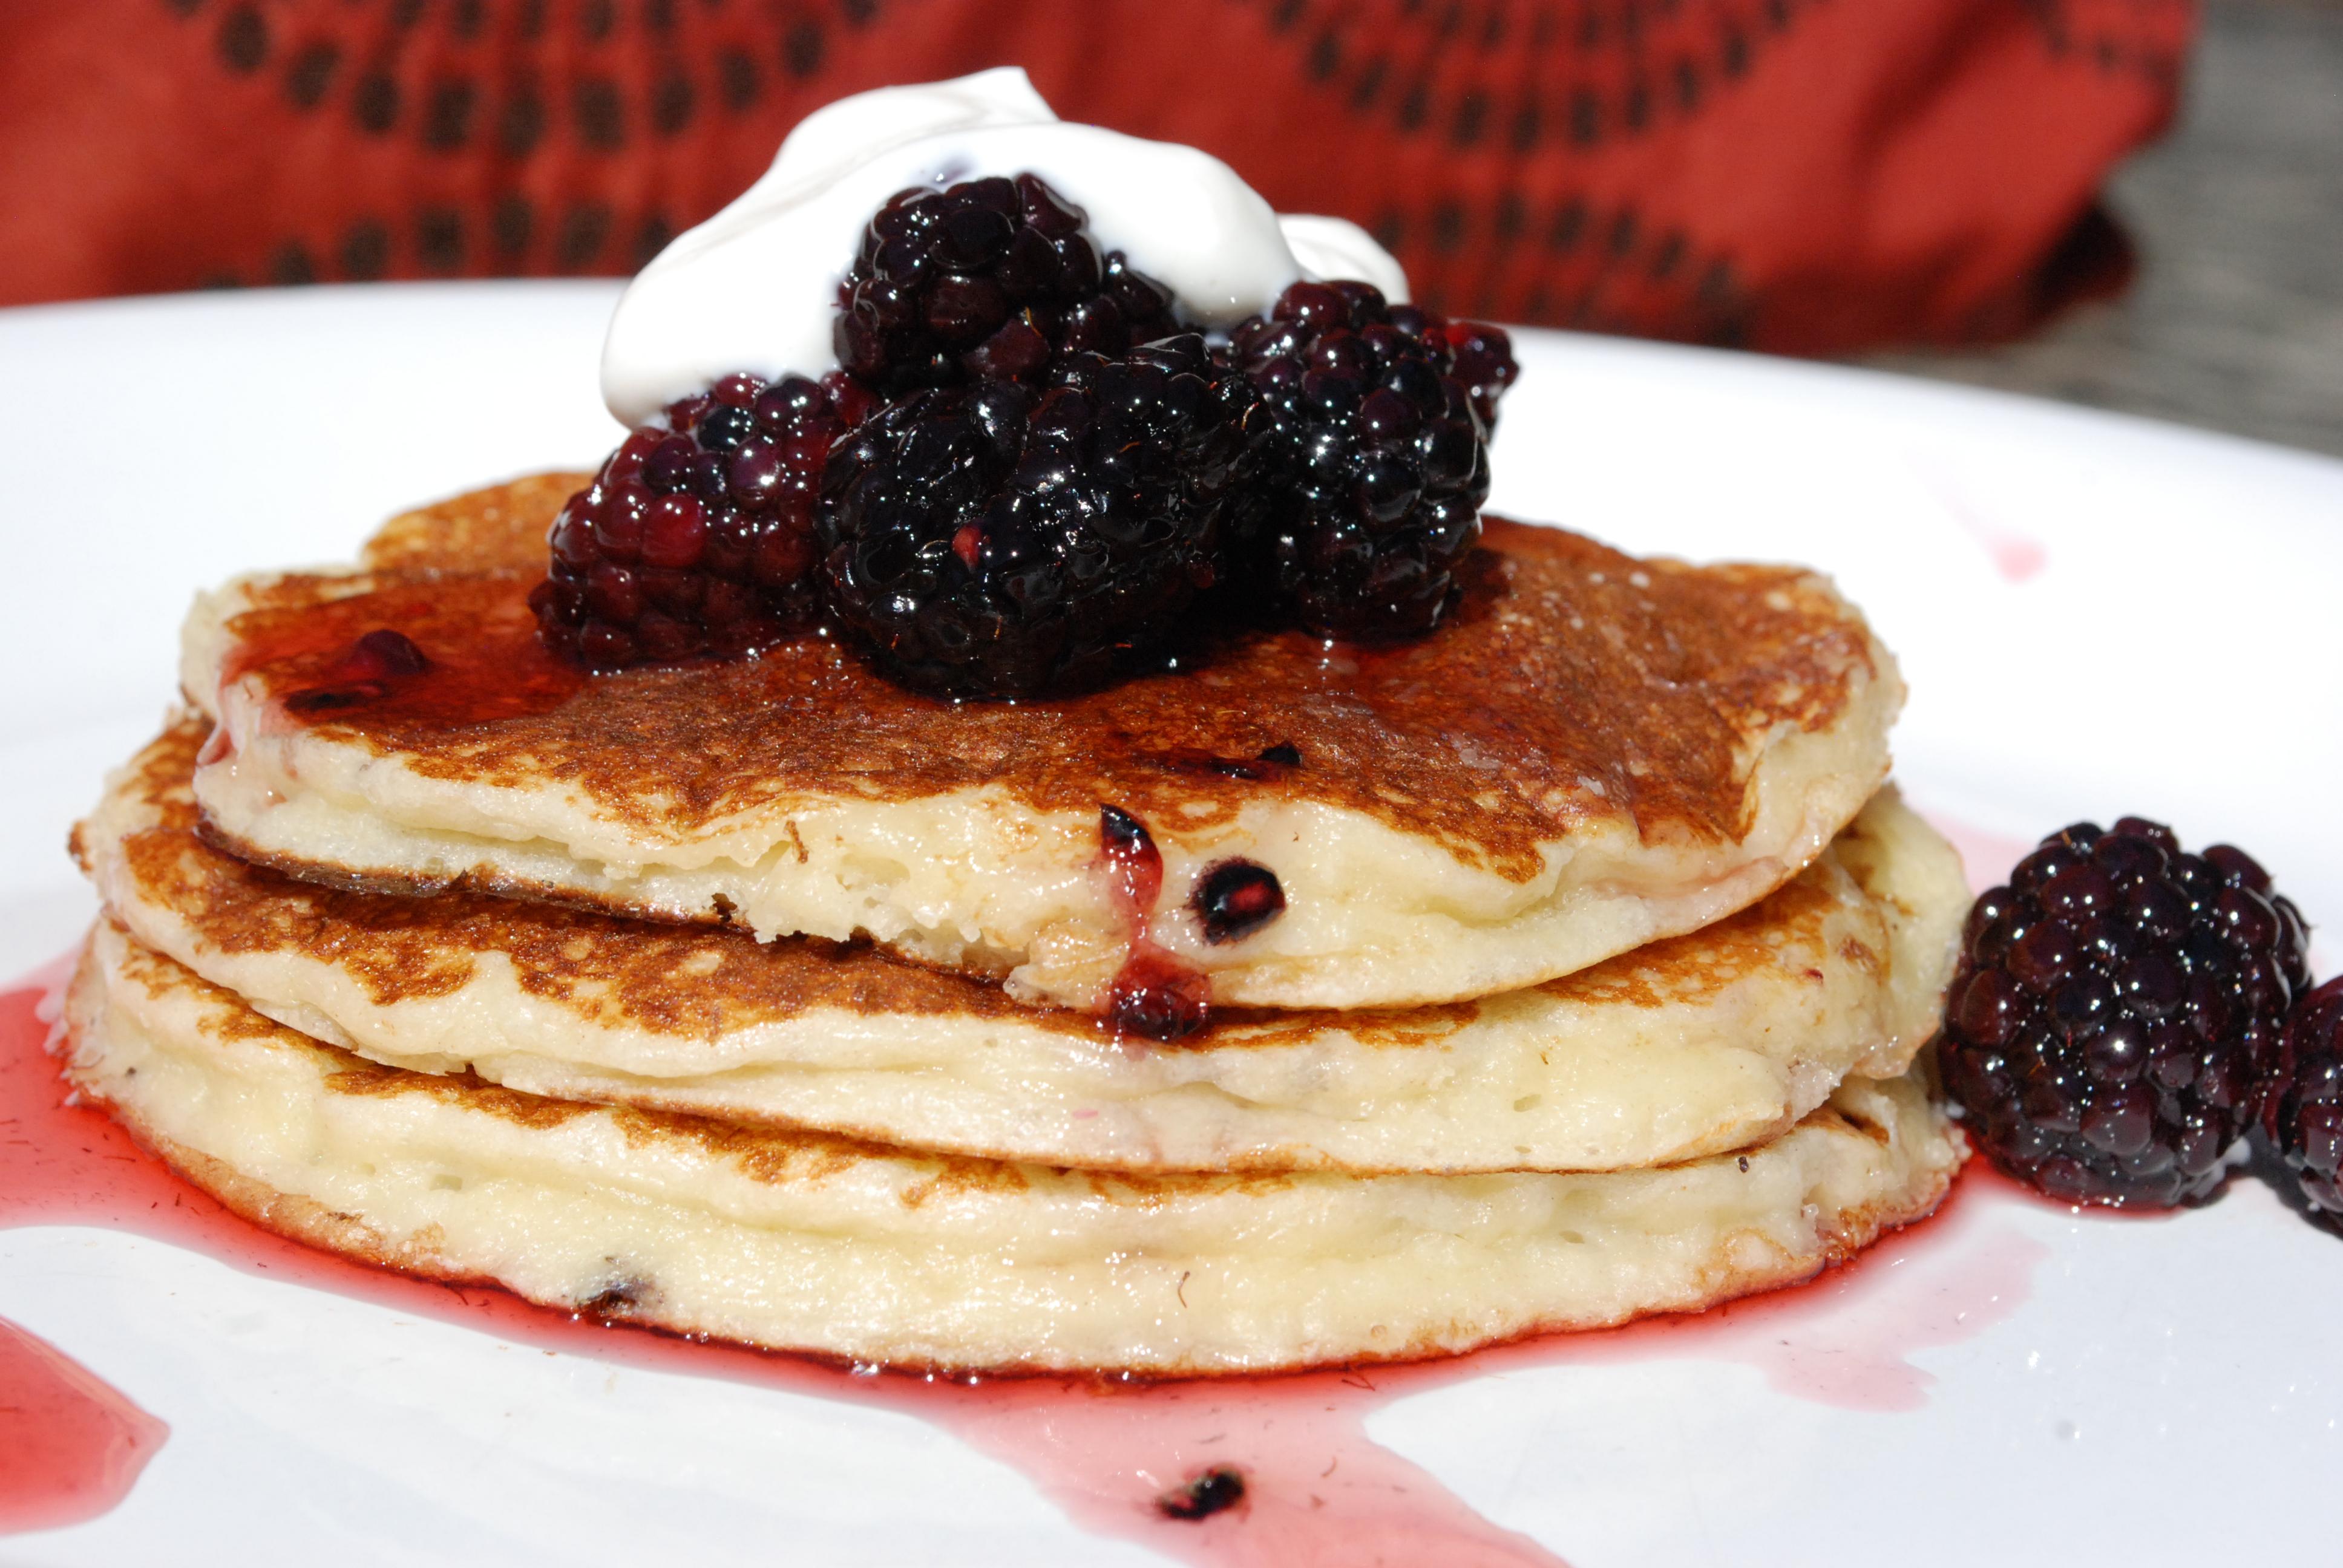 ... Pancakes with Blackberry Honey Syrup and Greek Yogurt Sweet Cream